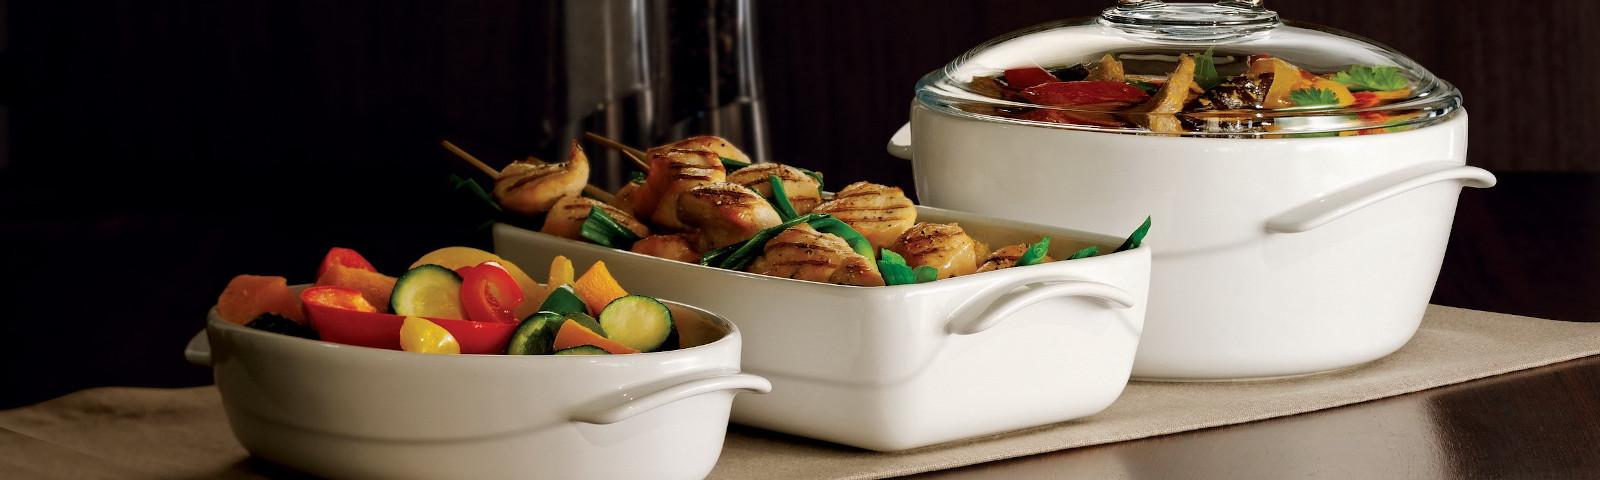 посуда для духовки фото